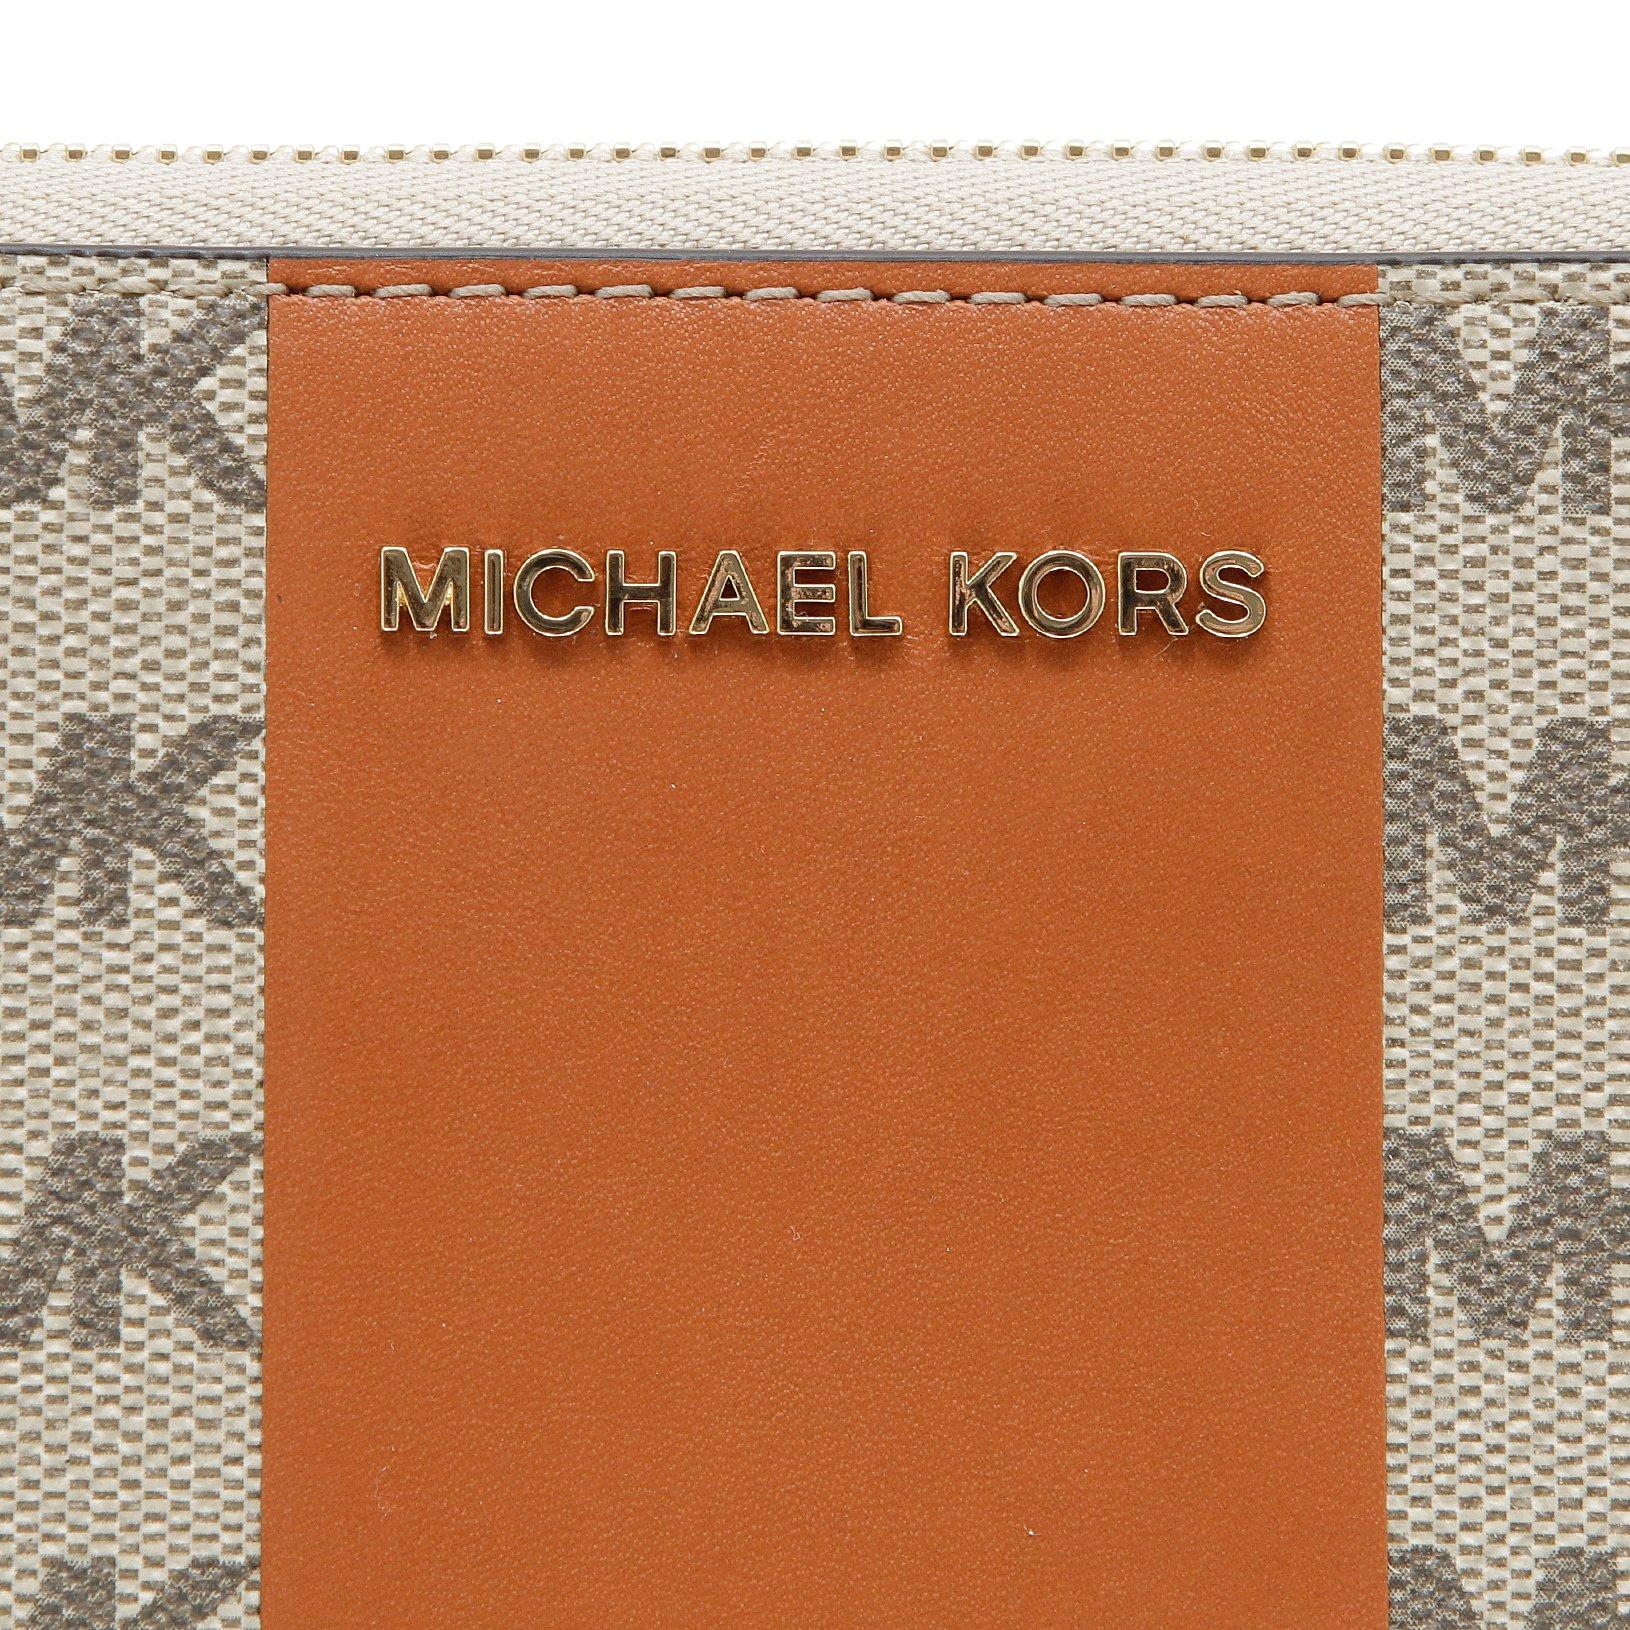 Michael Kors Studio Logo Print Continental Wallet by Michael Kors (Image #4)